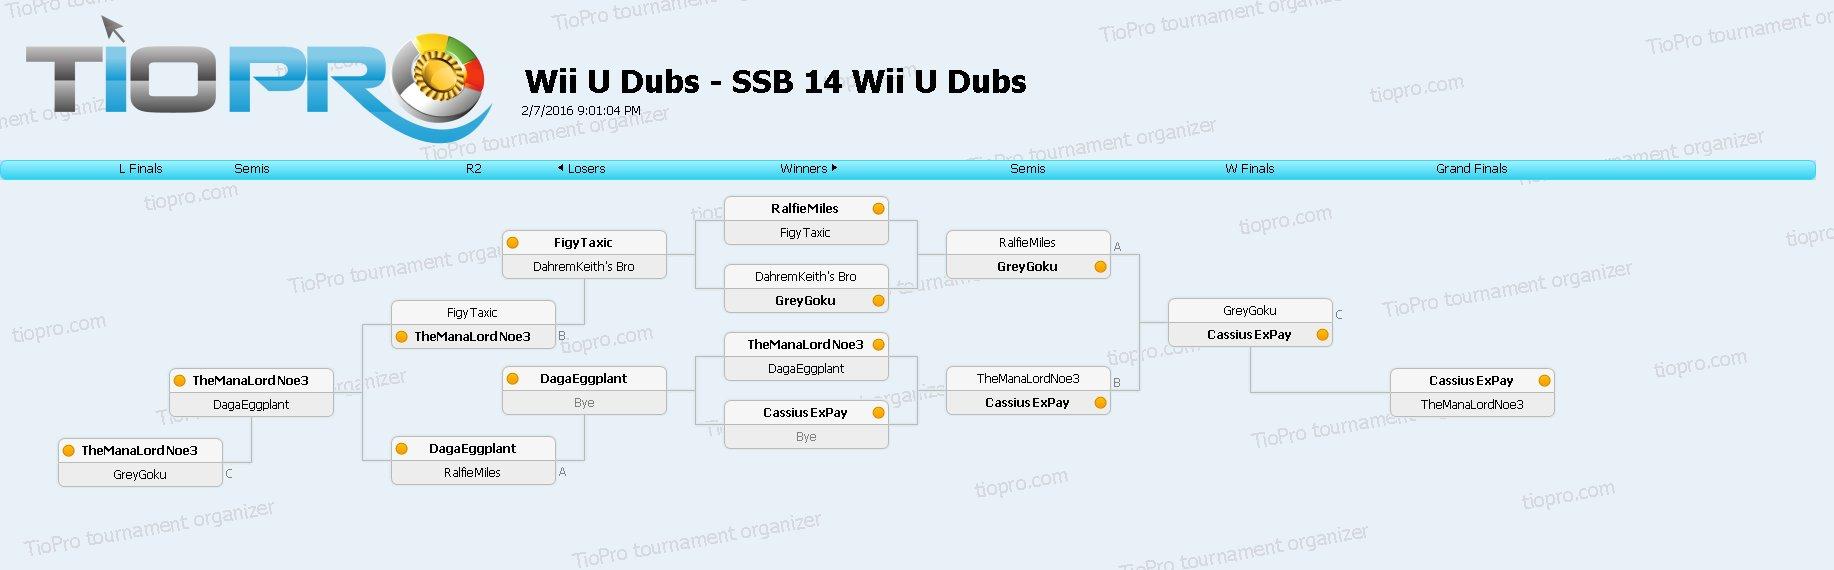 SSB14 Wii U Doubles